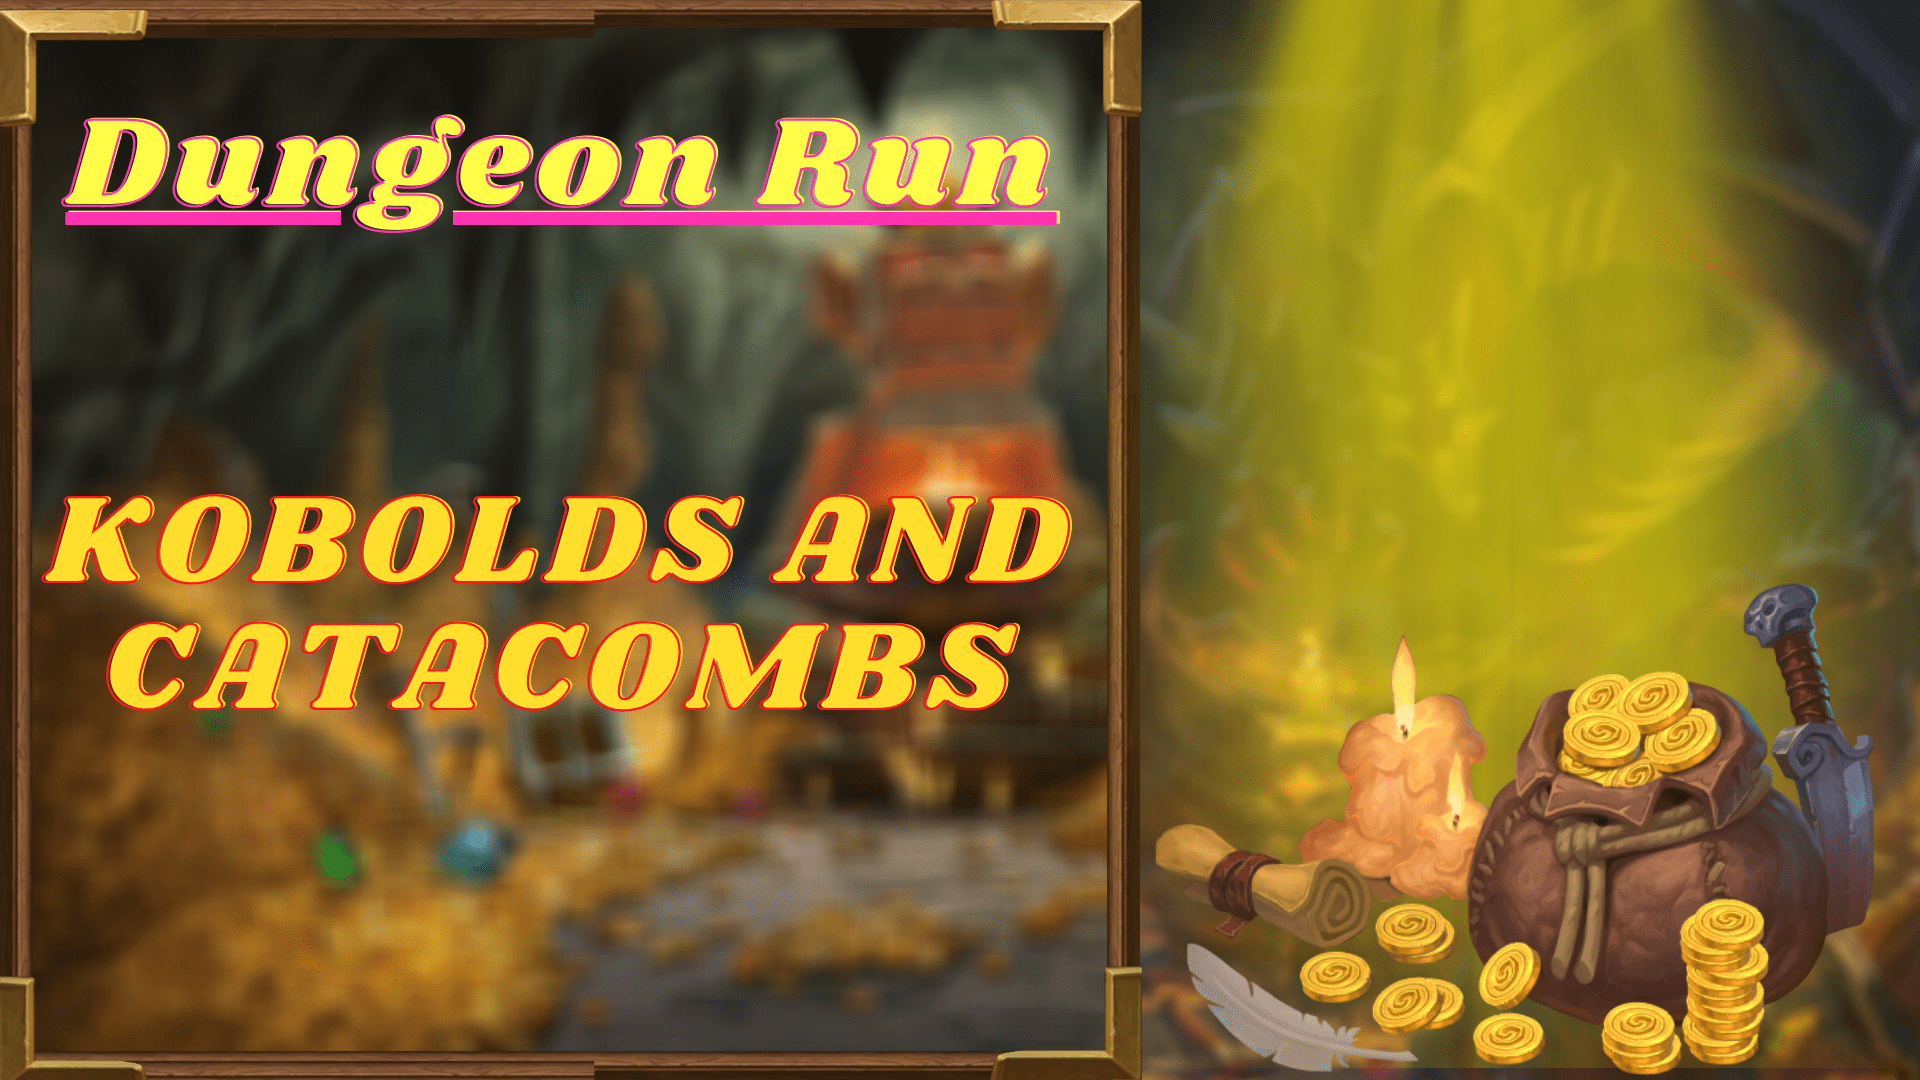 Dungeon run: Kobolds and Catacombs GBD - e2p.com